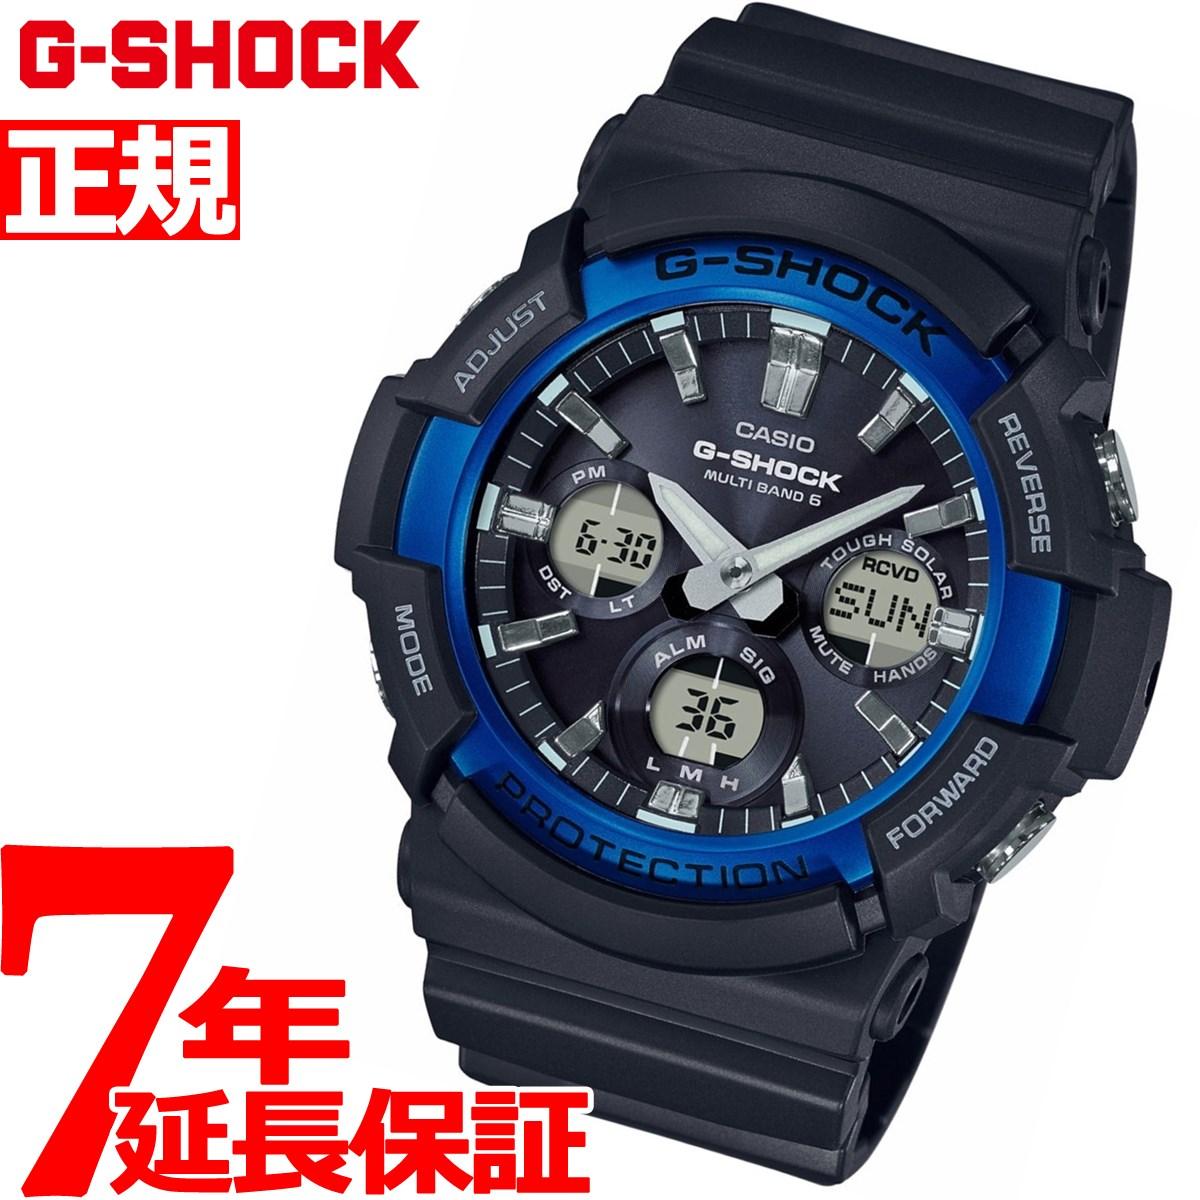 G-SHOCK 電波 ソーラー 腕時計 メンズ タフソーラー GAW-100B-1A2JF